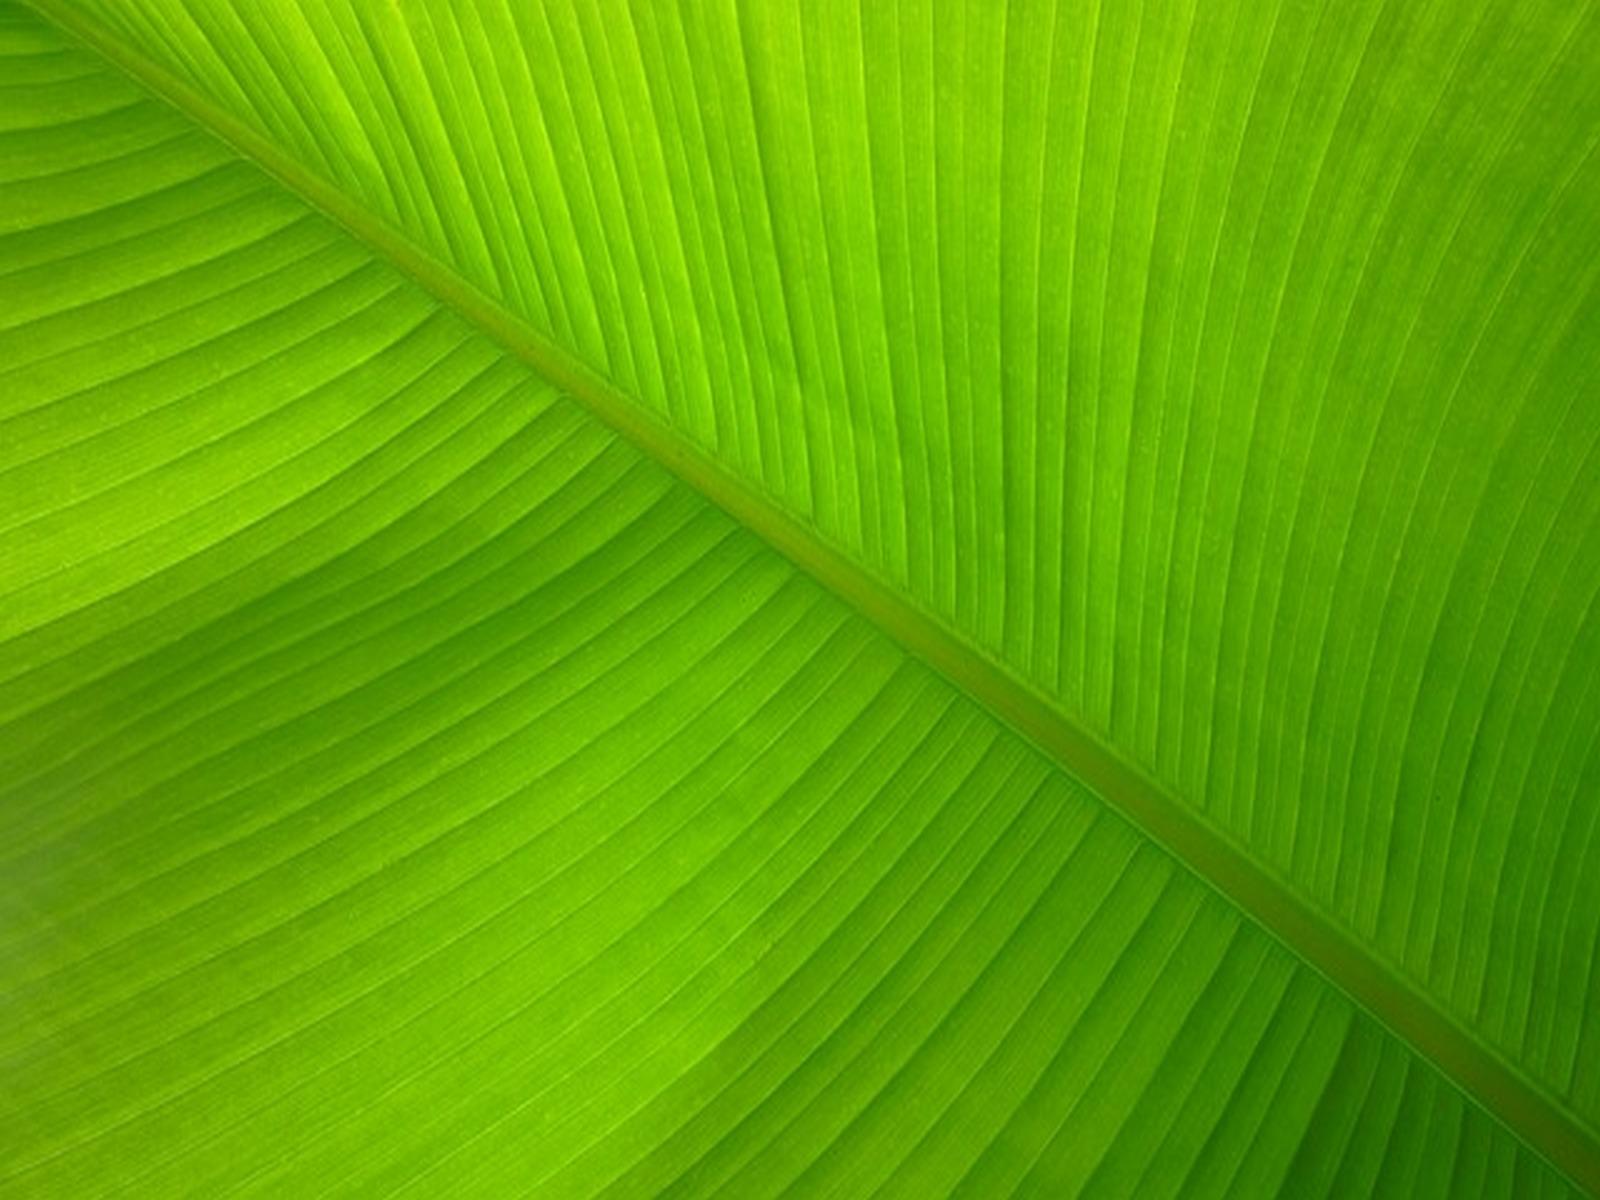 powerpoint background banana leaf wallpaper